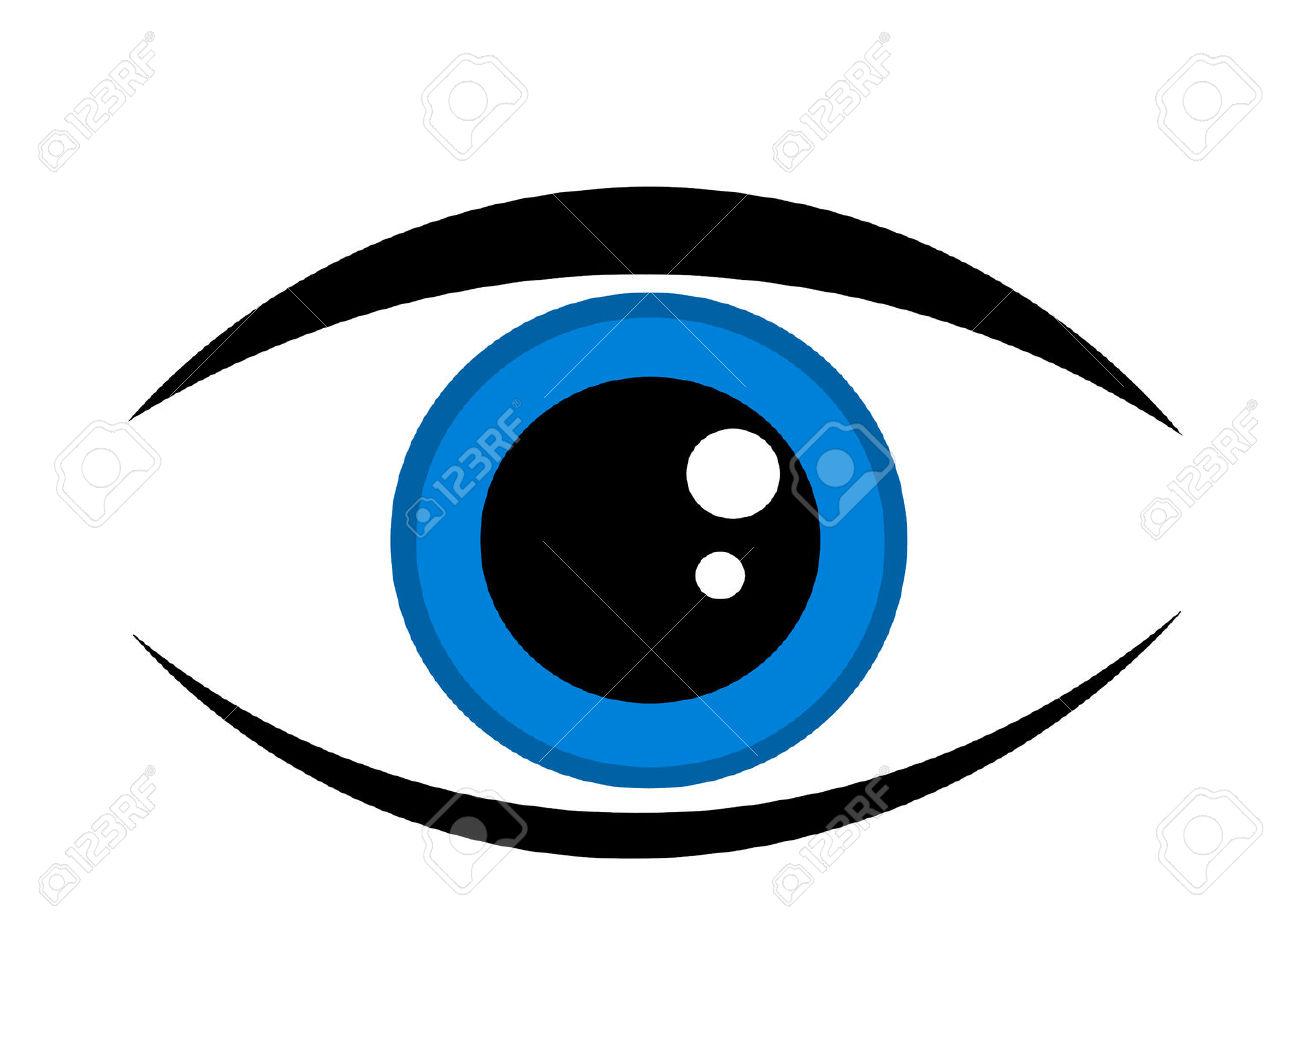 1 blue eye clipart.